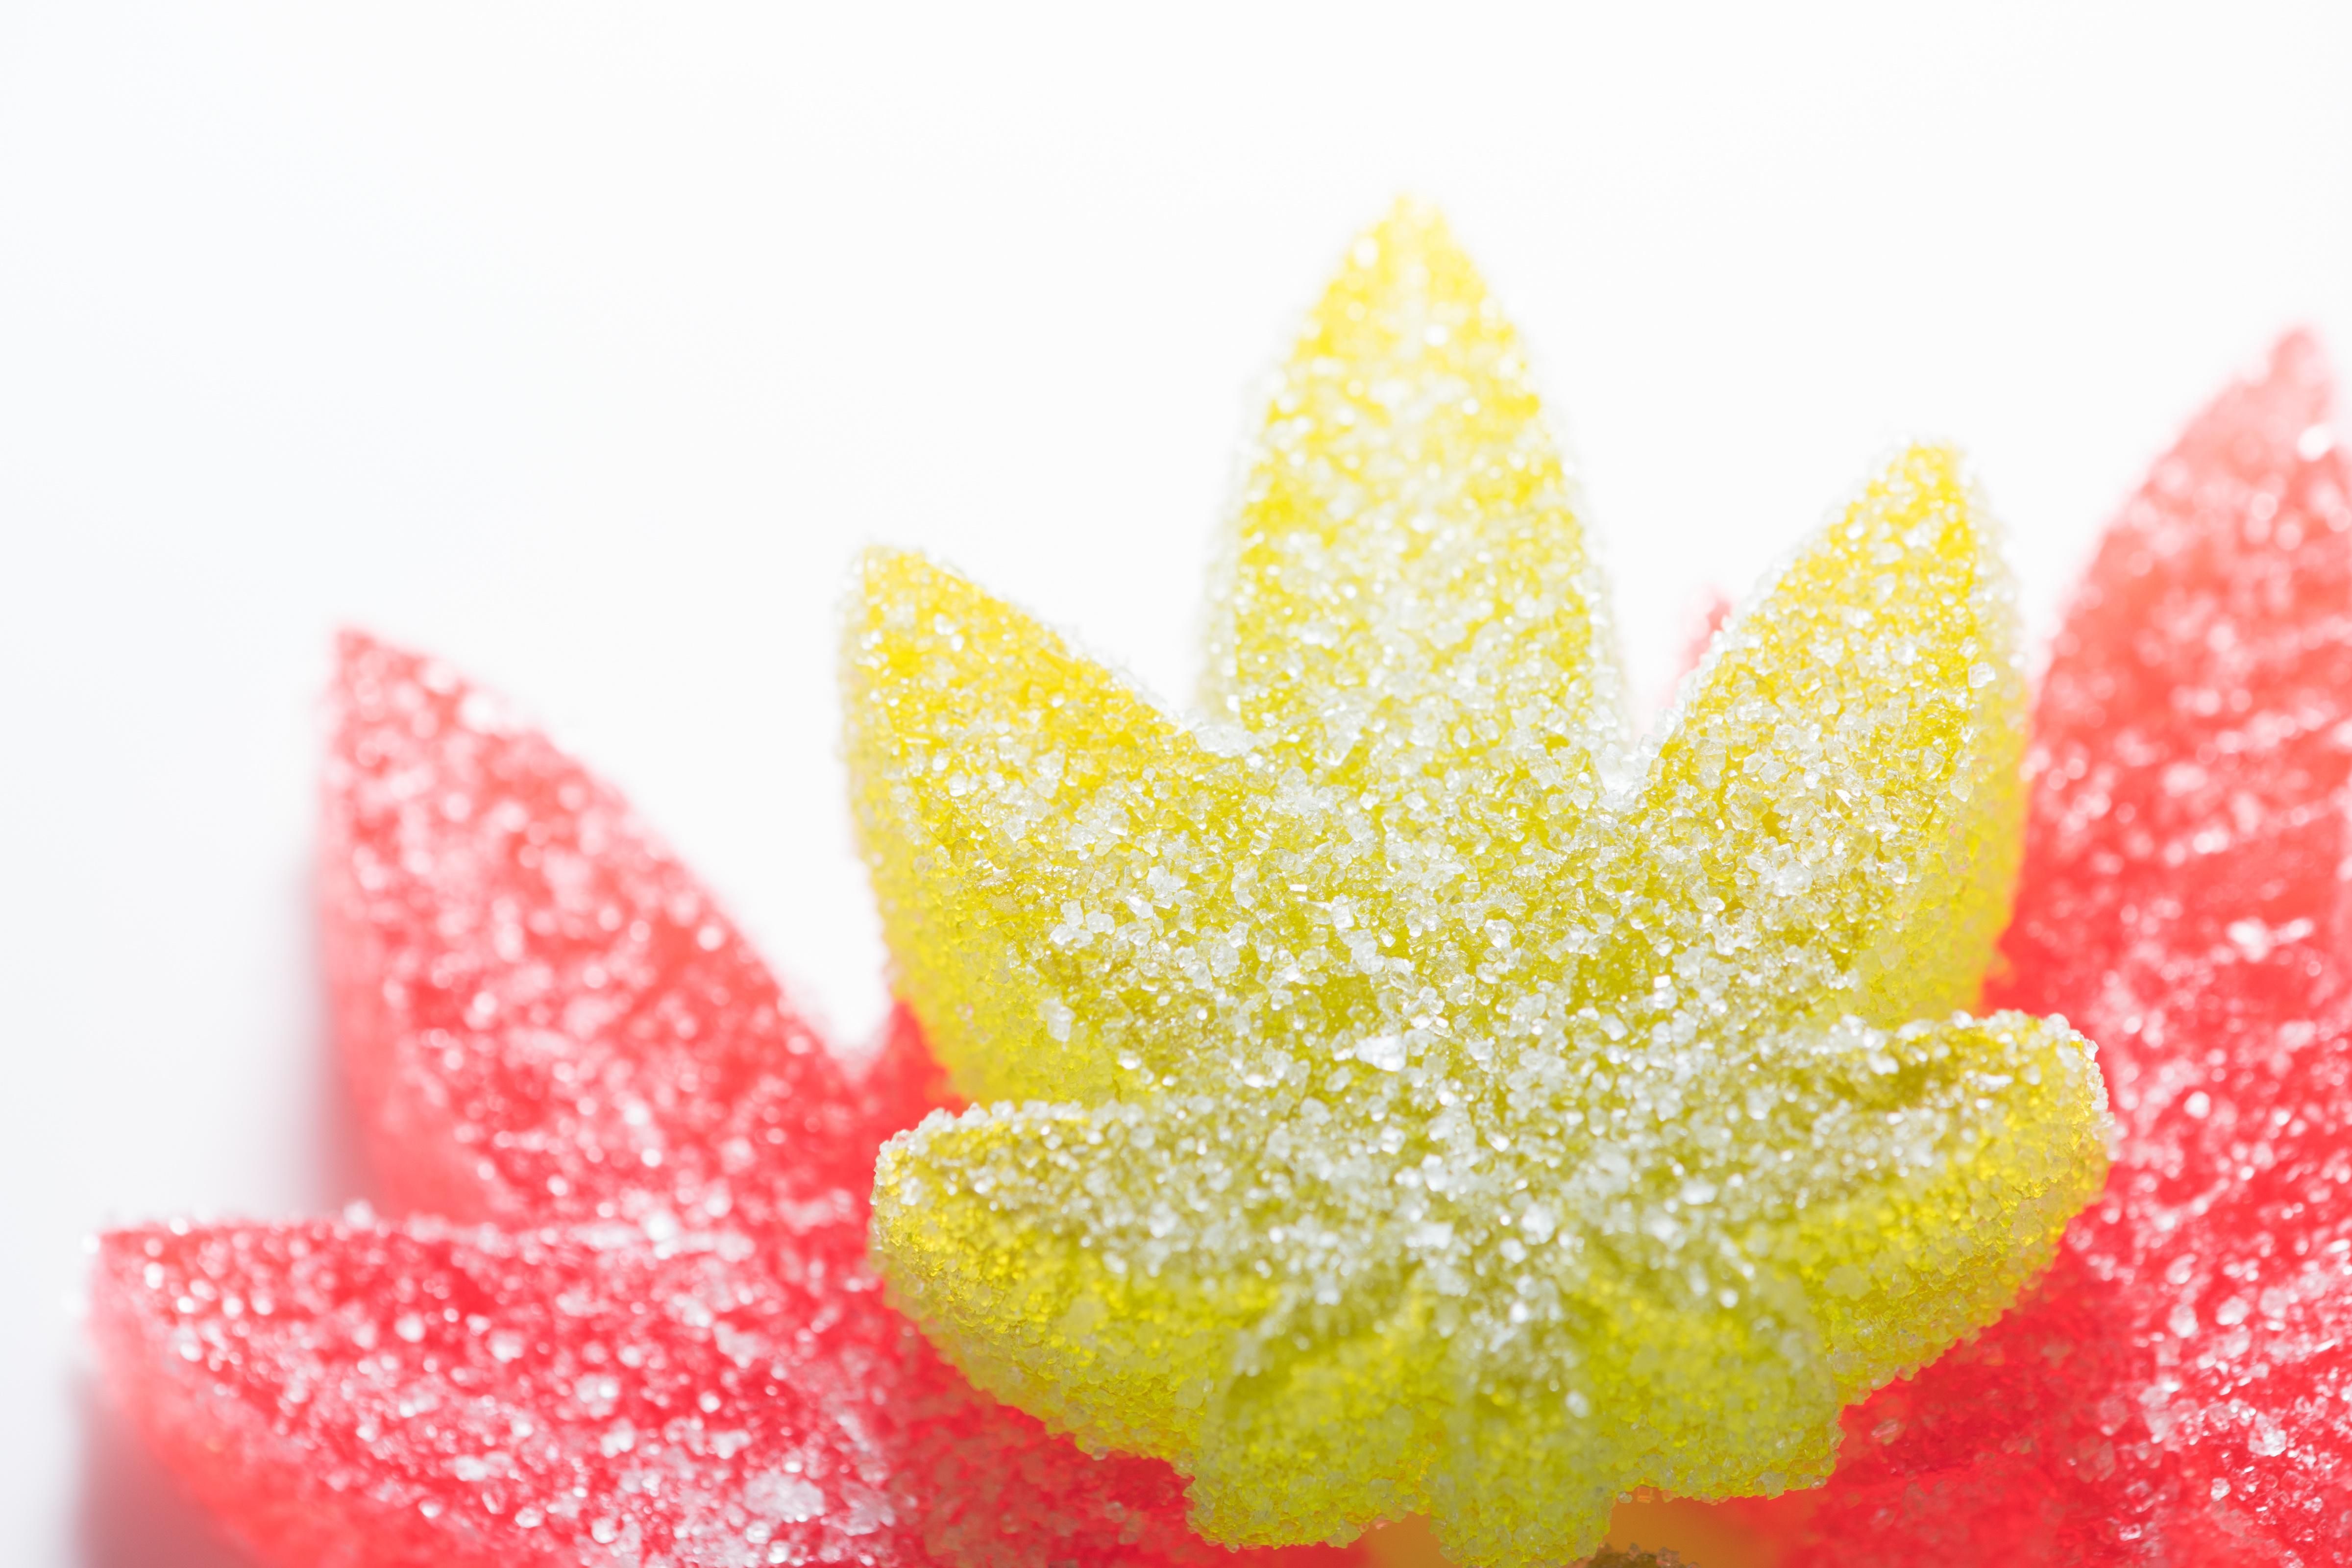 uploads///cannabis edibles